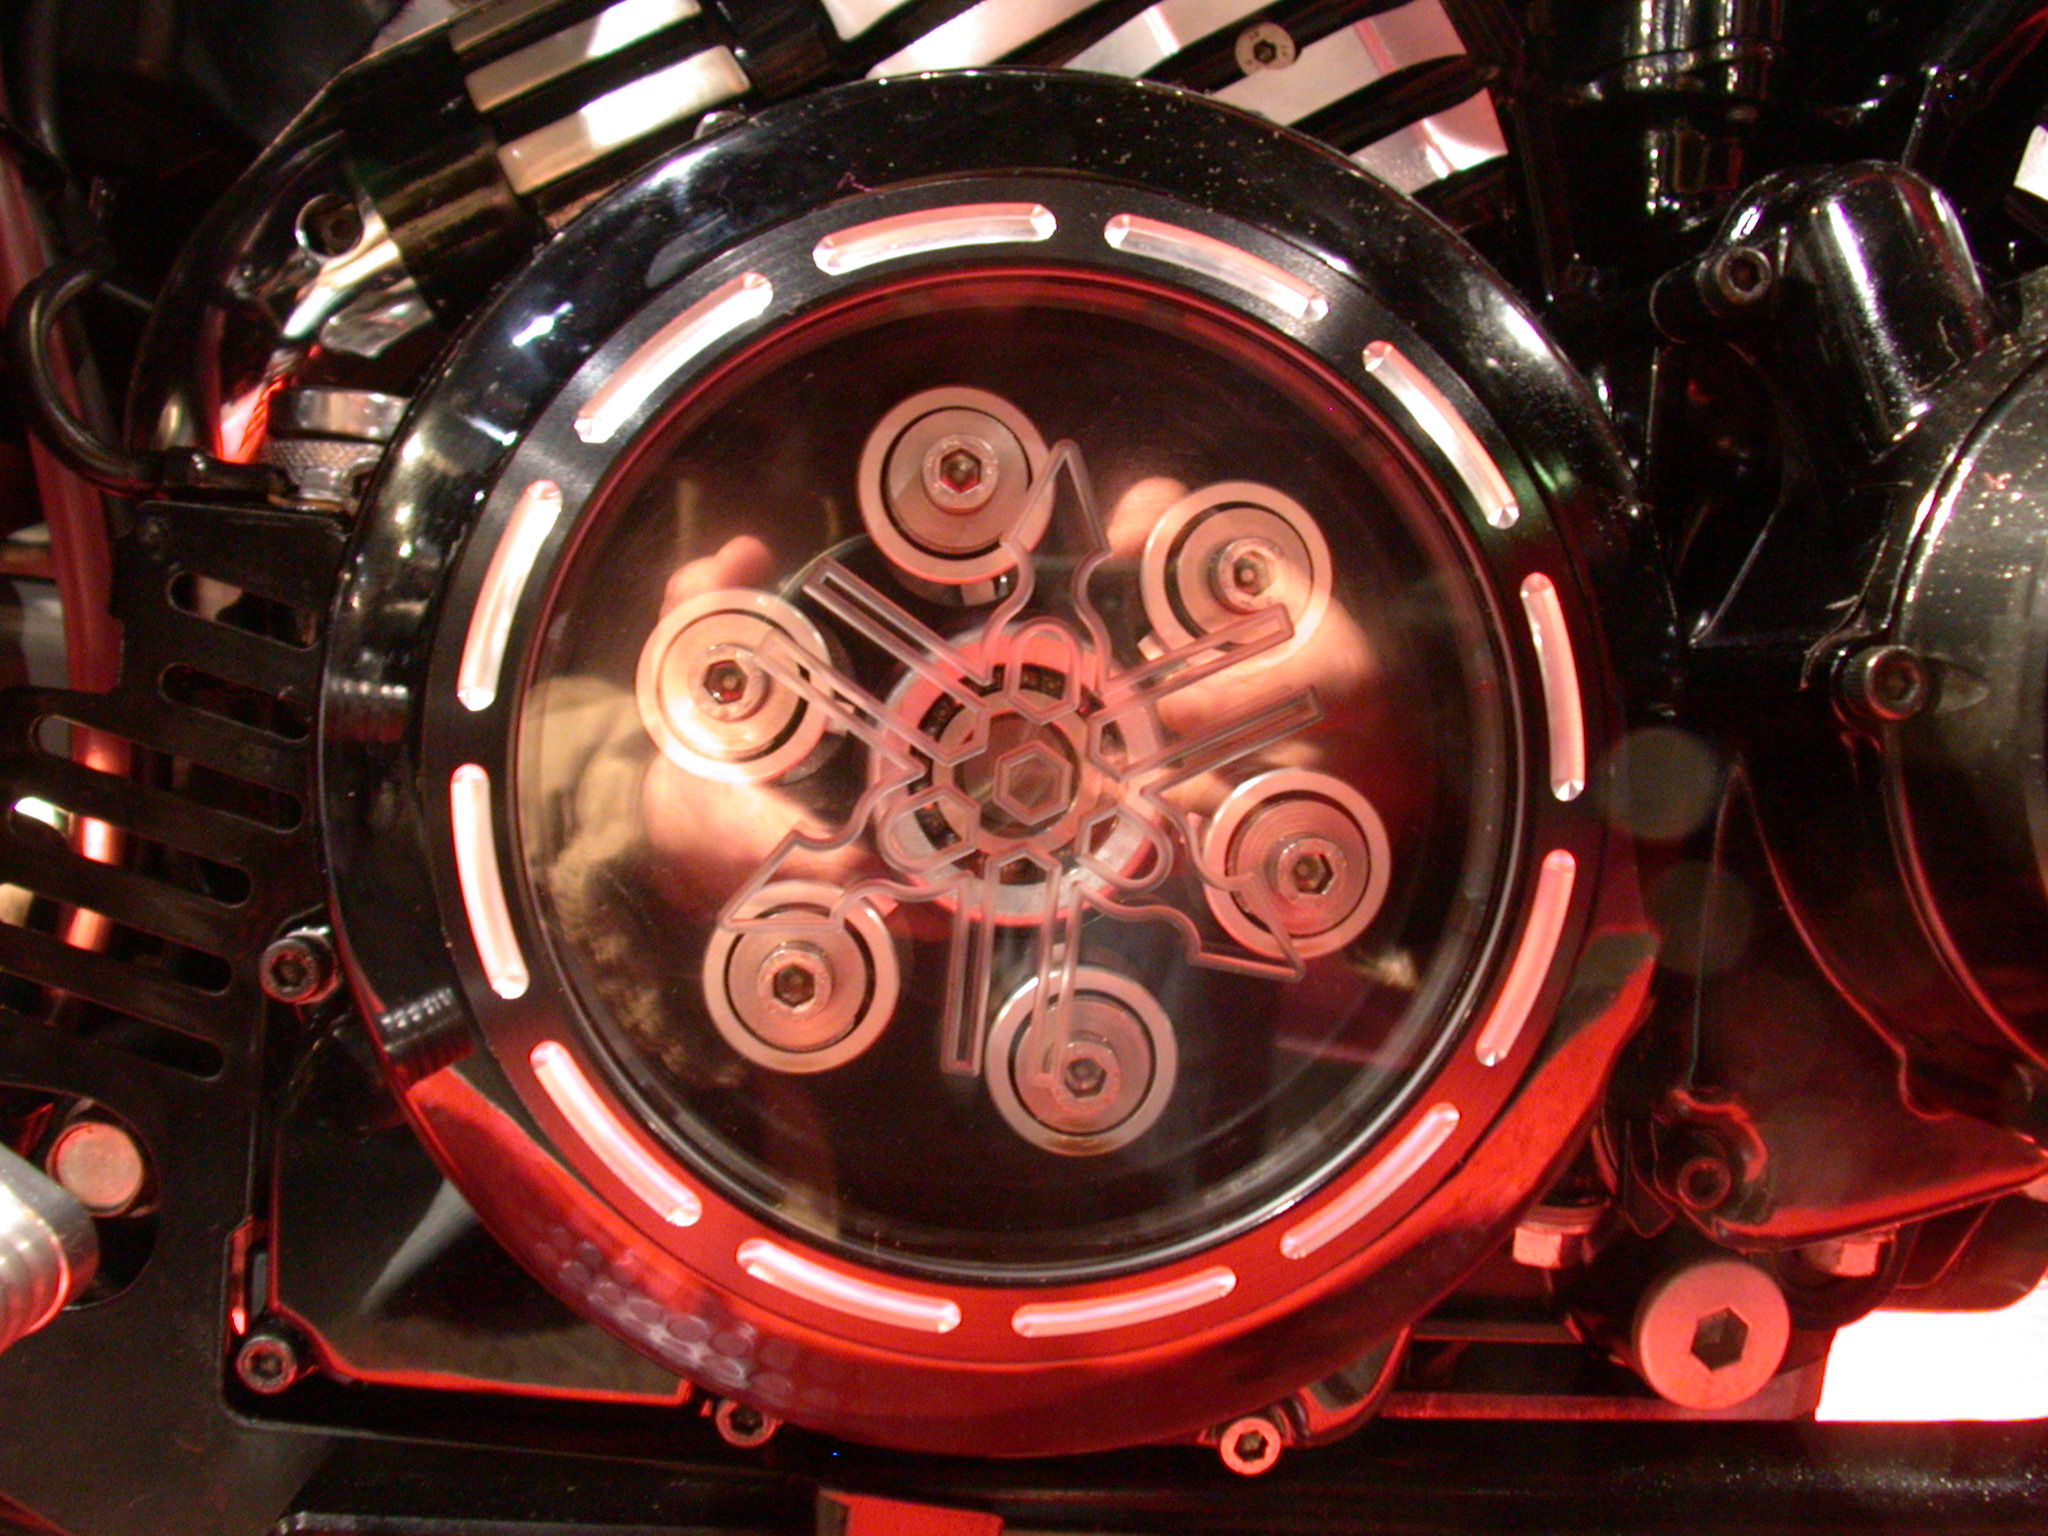 bike engine futuristic round circle